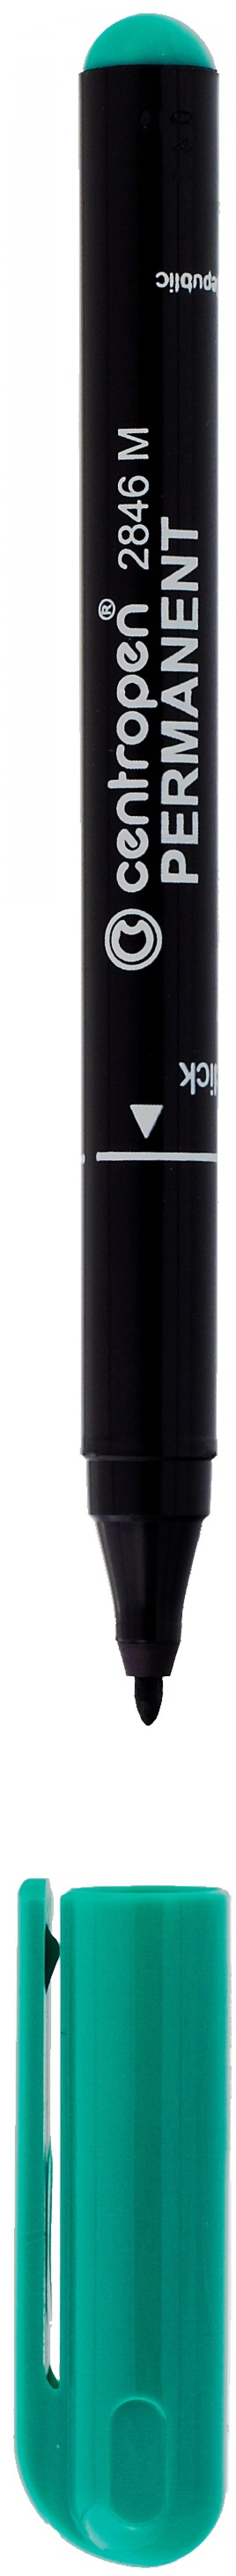 Маркер перманентный Centropen 2846/1З 1 мм зеленый 2846/1З cool custom led running door sill strip welcome pedal scuff sill plates cover stickers car stying for mazda cx 5 2013 2014